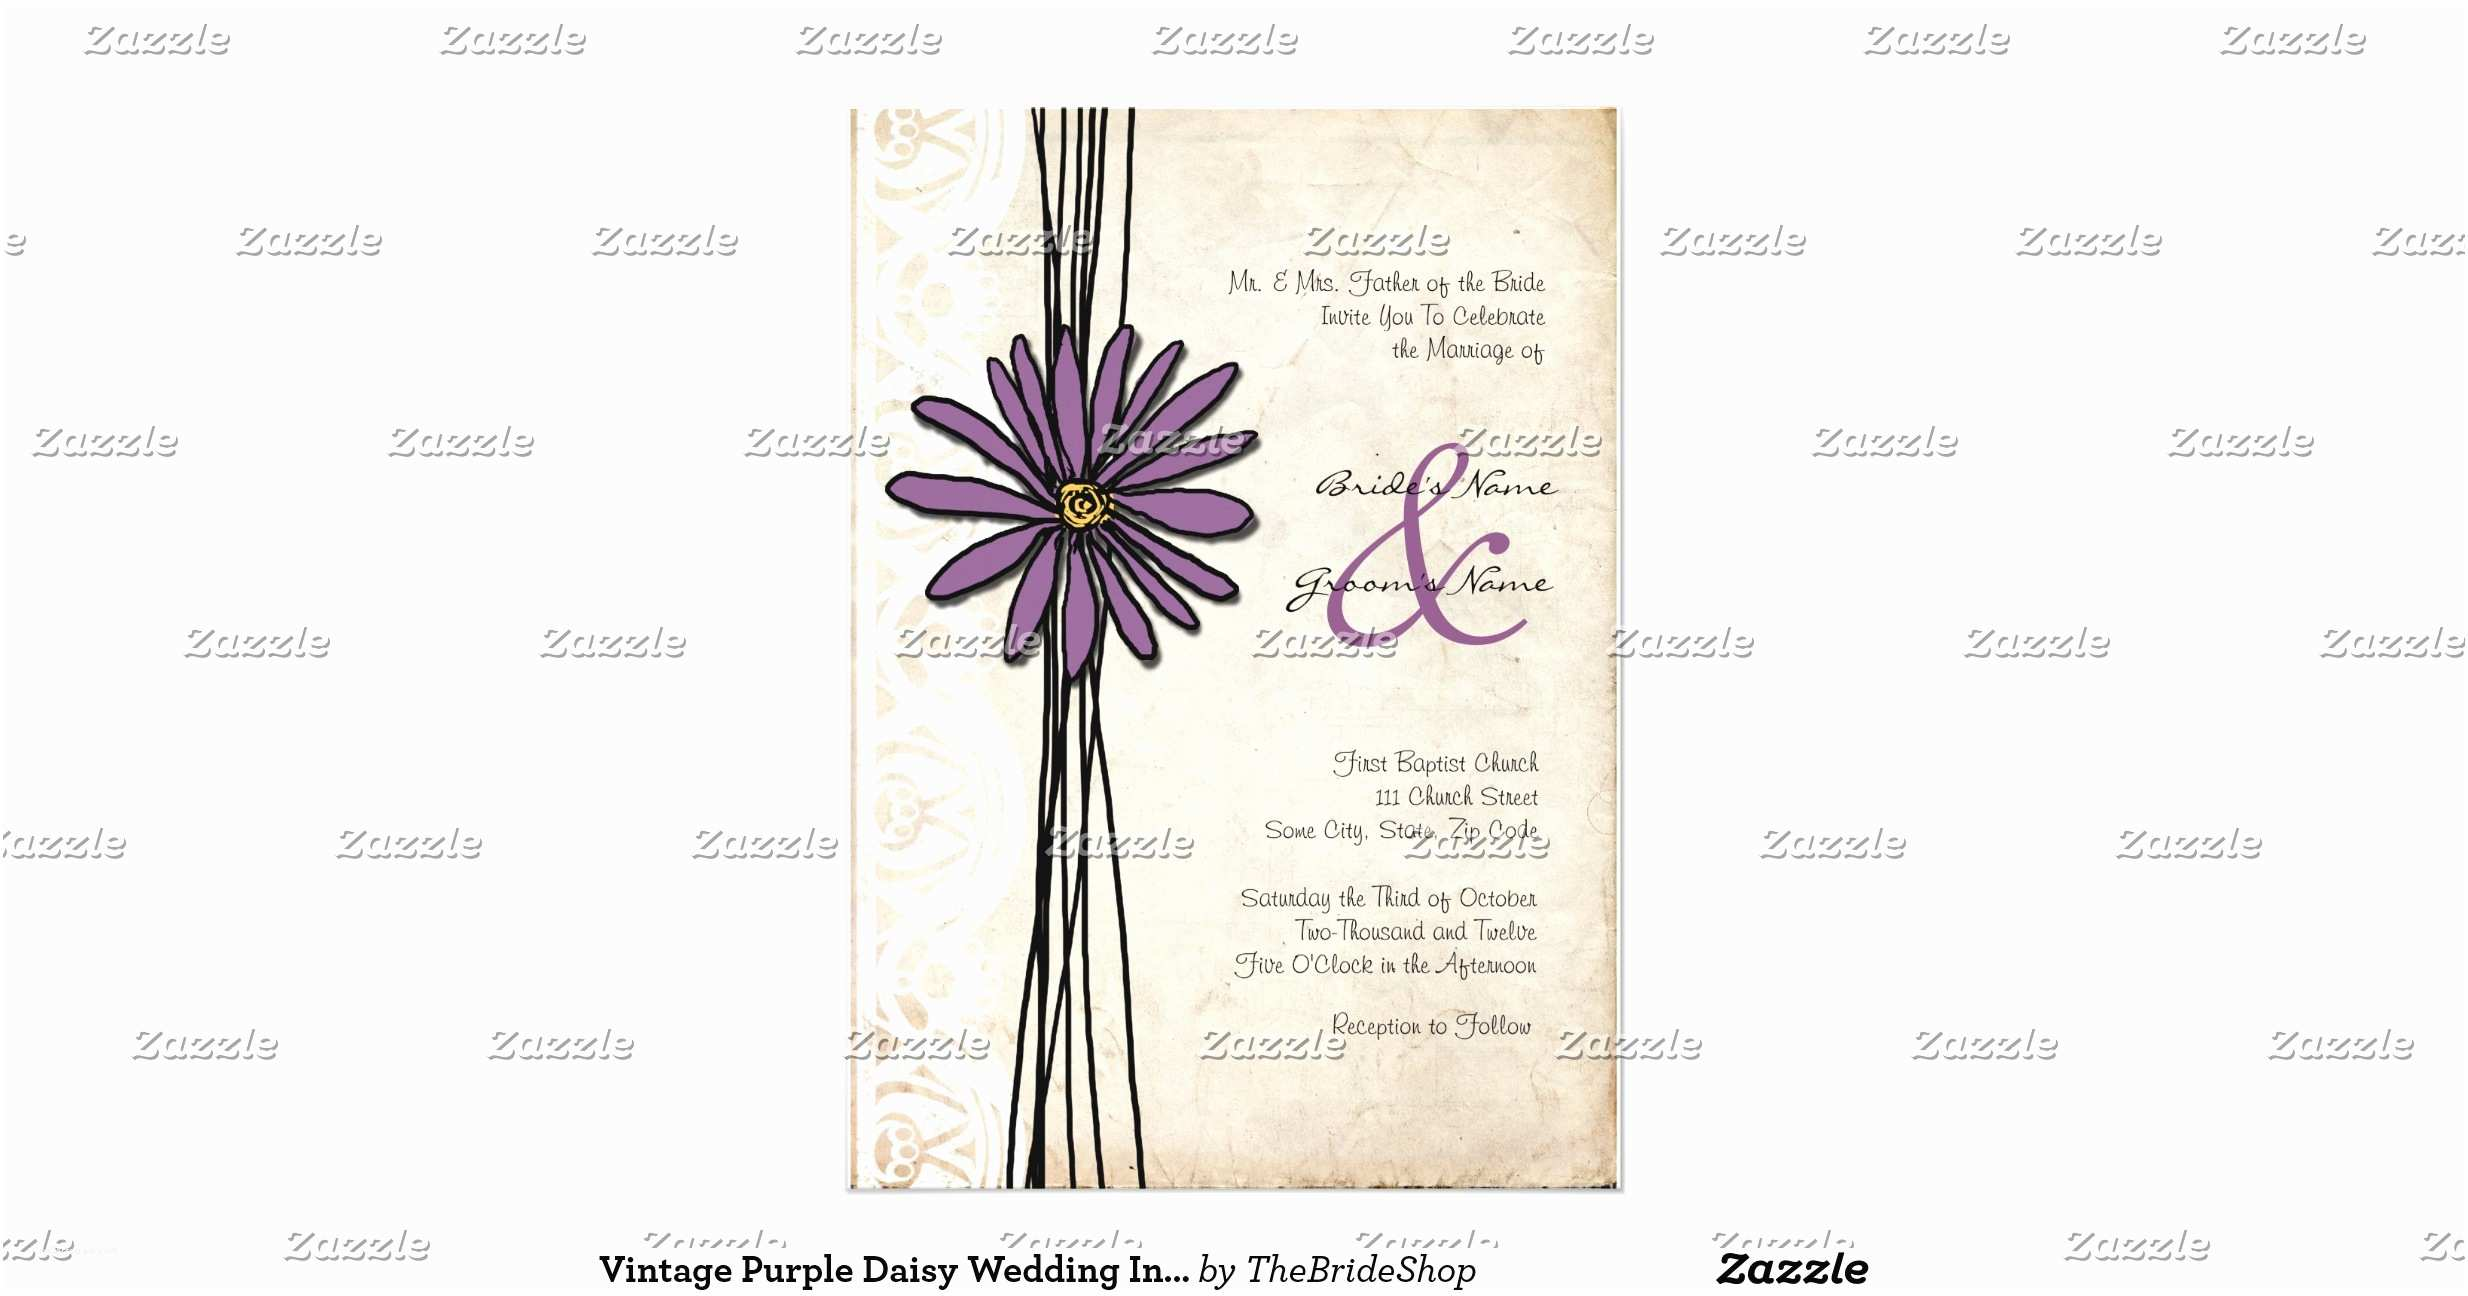 Daisy Wedding  Vintage Purple Daisy Wedding